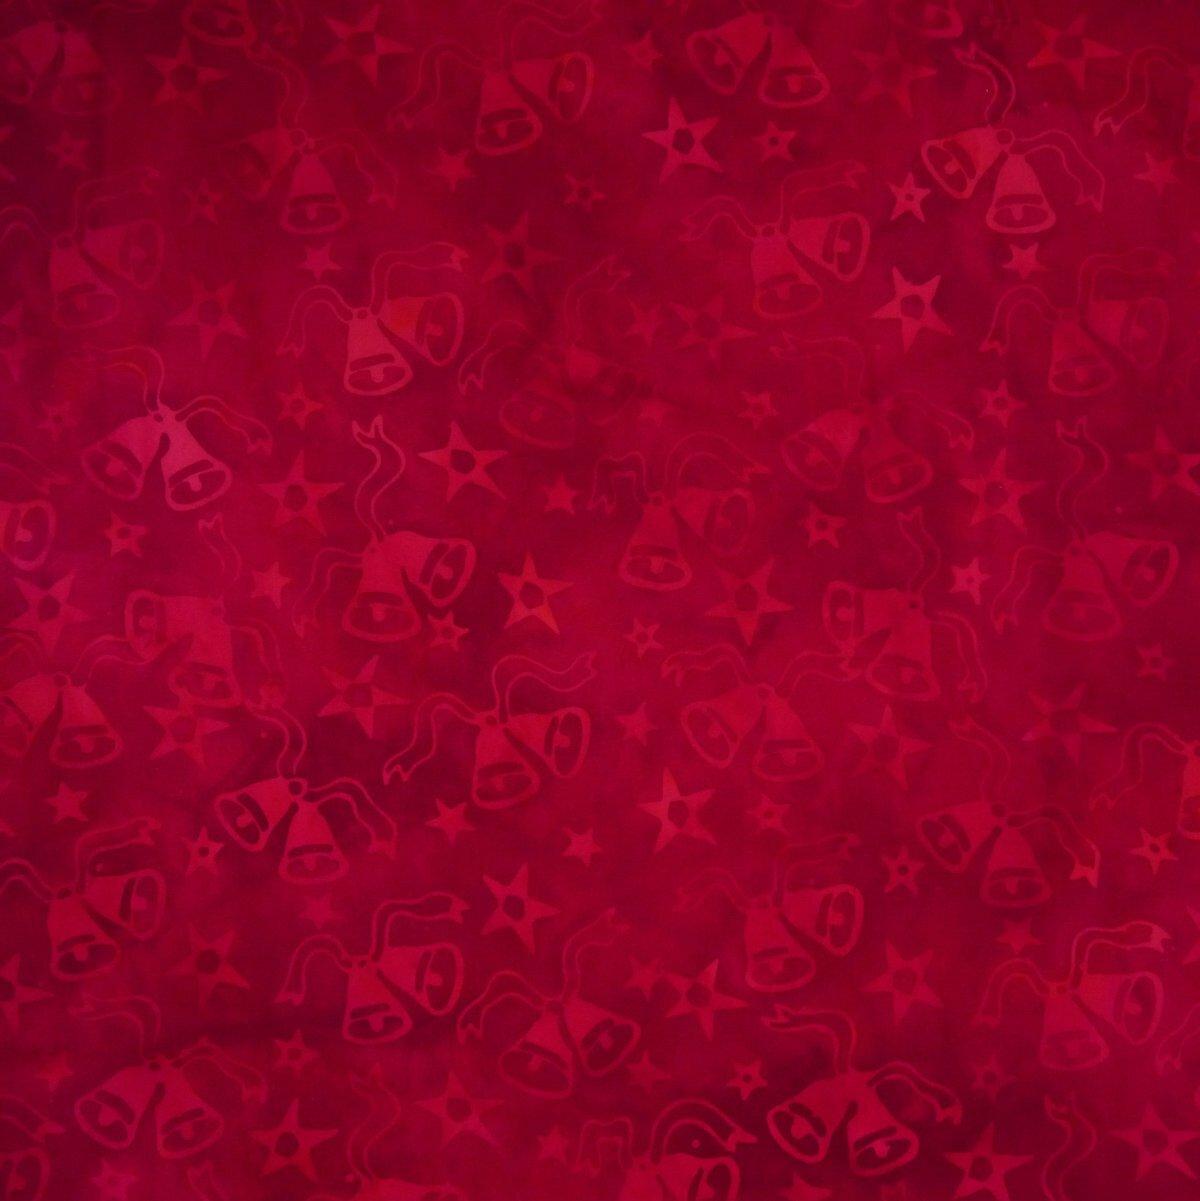 Shrub Red - Flicker Flair - Batik - 1/2m cut 56226